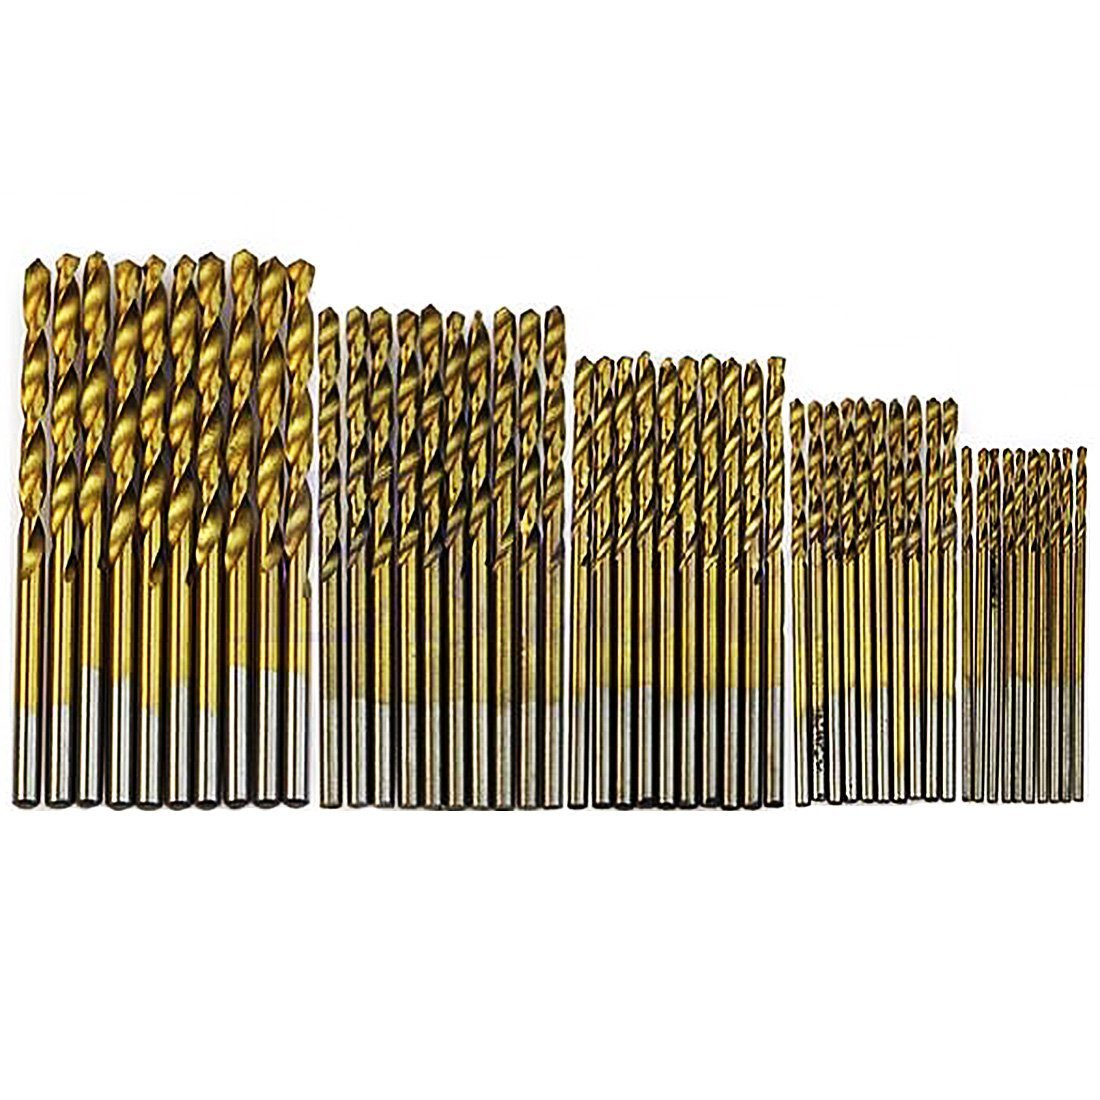 BananaB 50Pcs Plating Titanium Coated Metal HSS High Speed Steel Drill Bit Set Tool